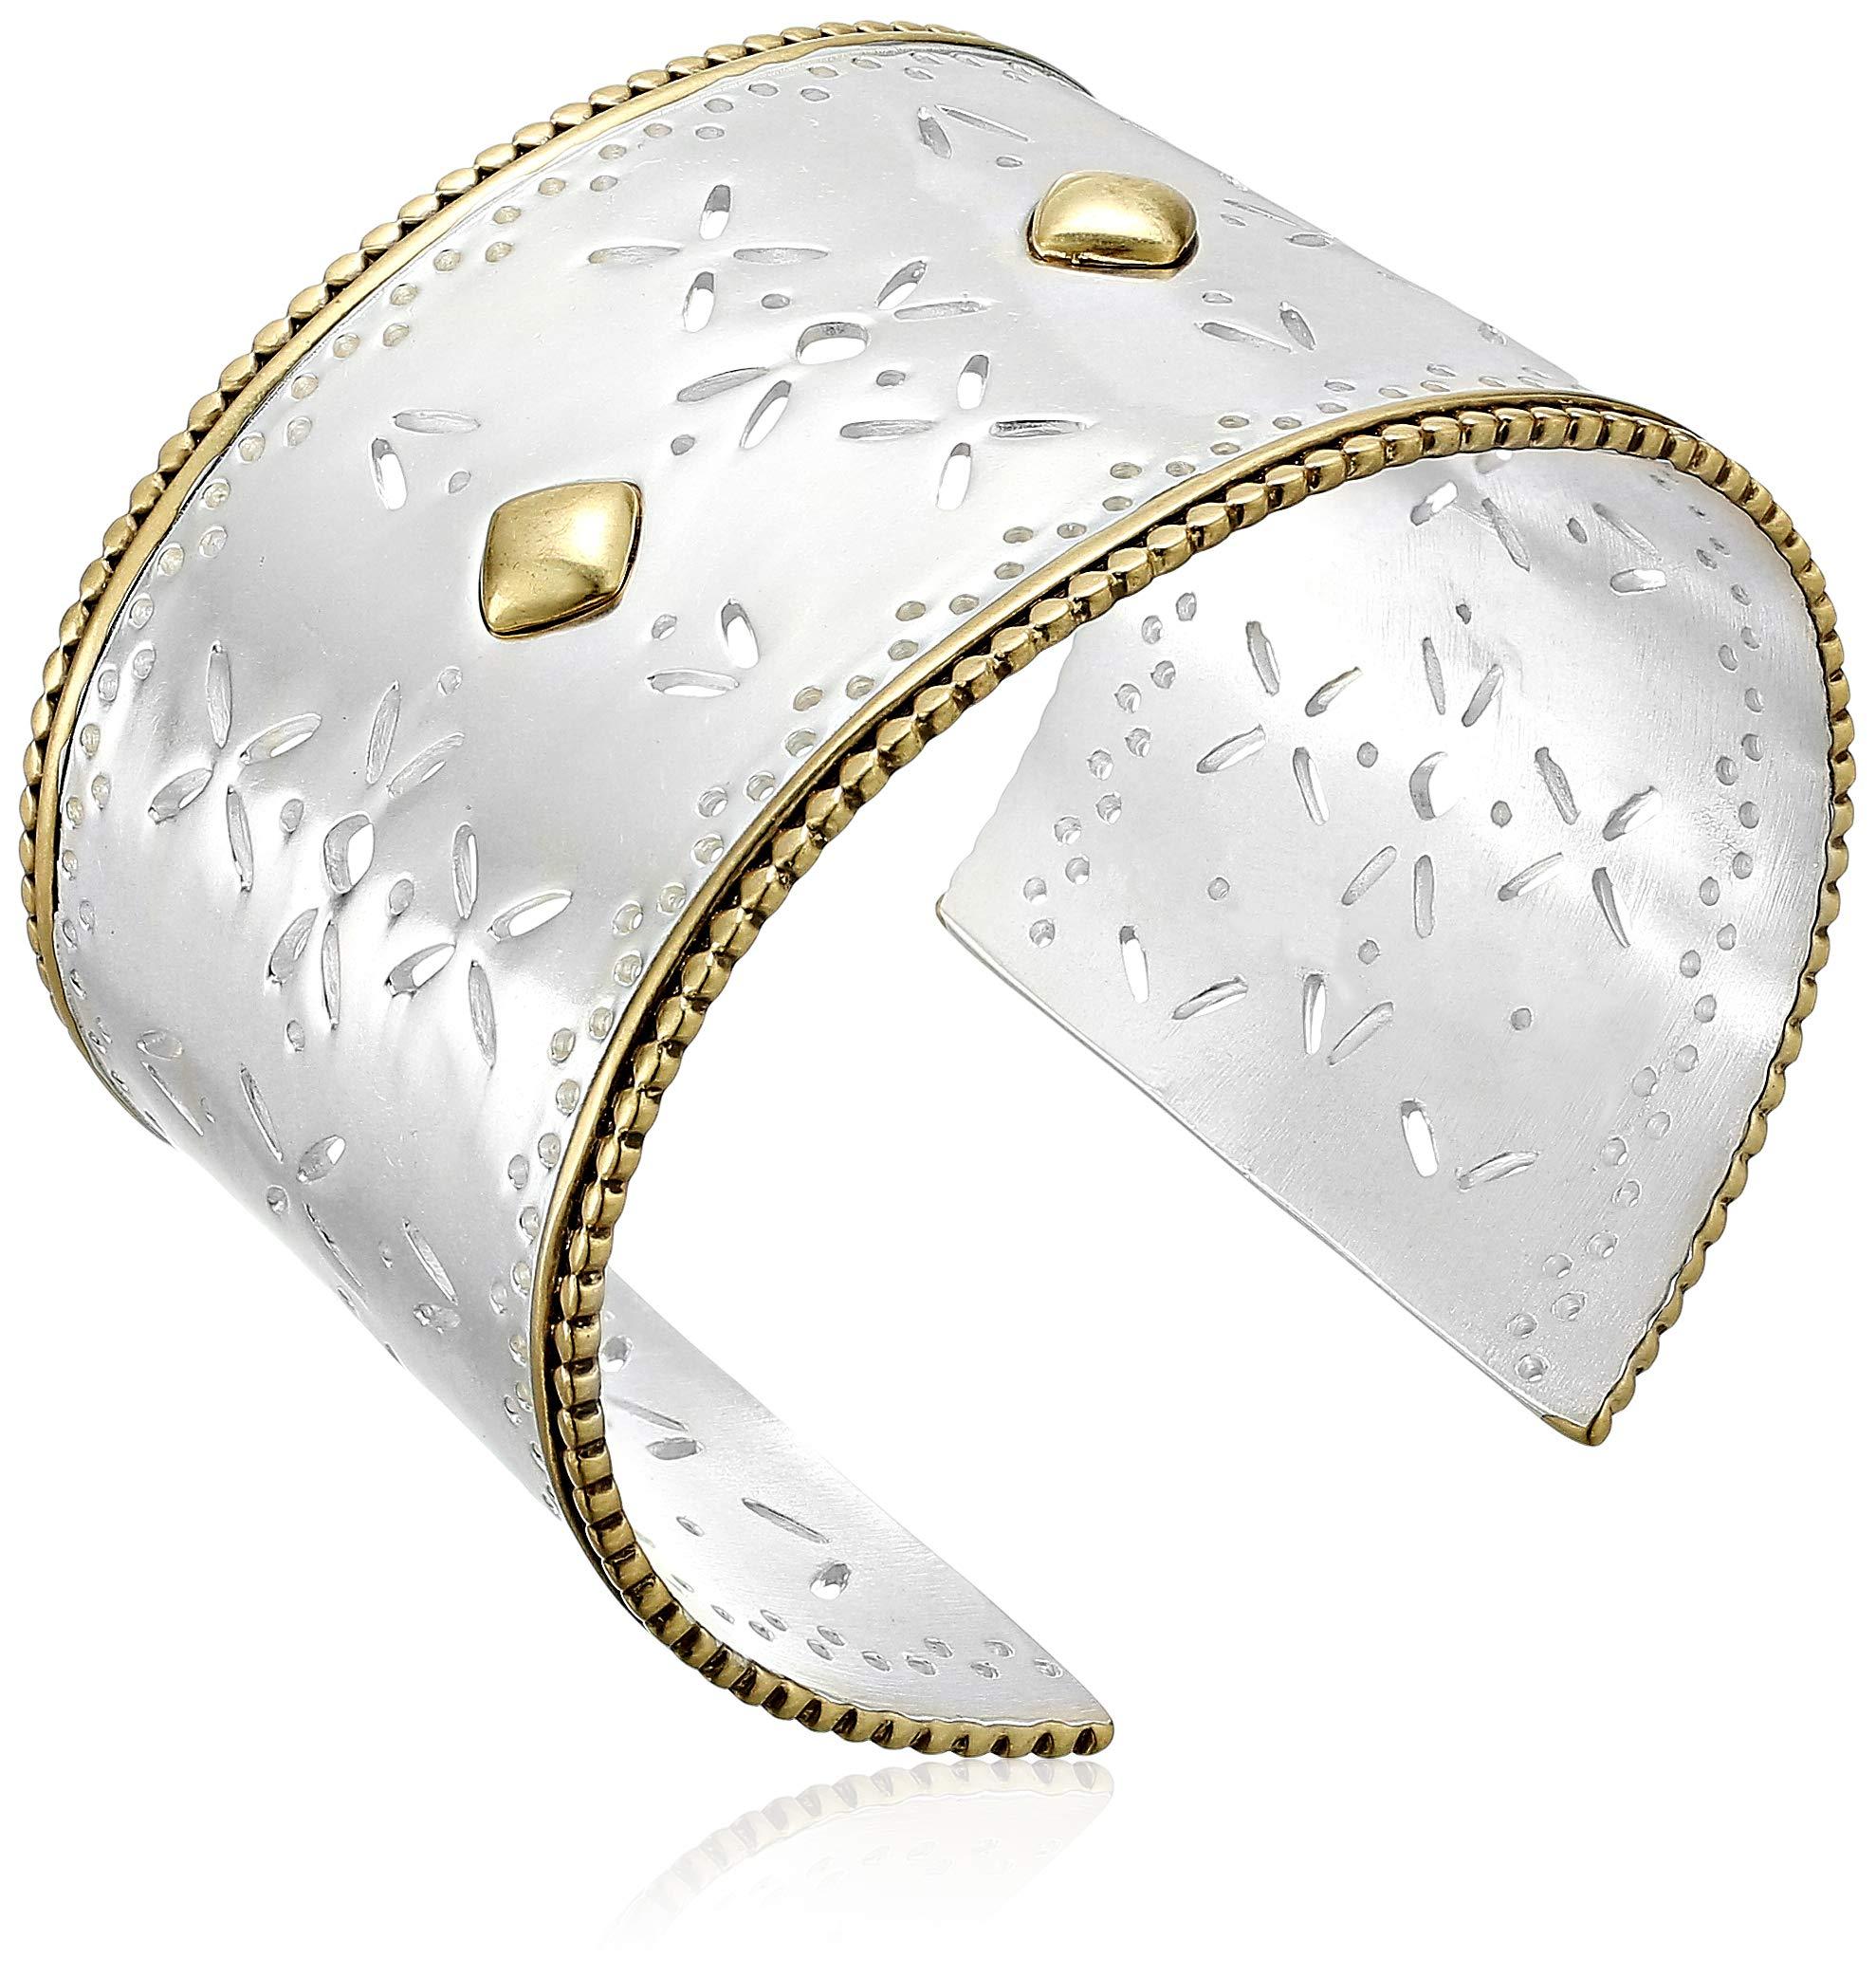 Lucky Brand Women's Tribal Statement Cuff Bracelet, Two Tone, One Size